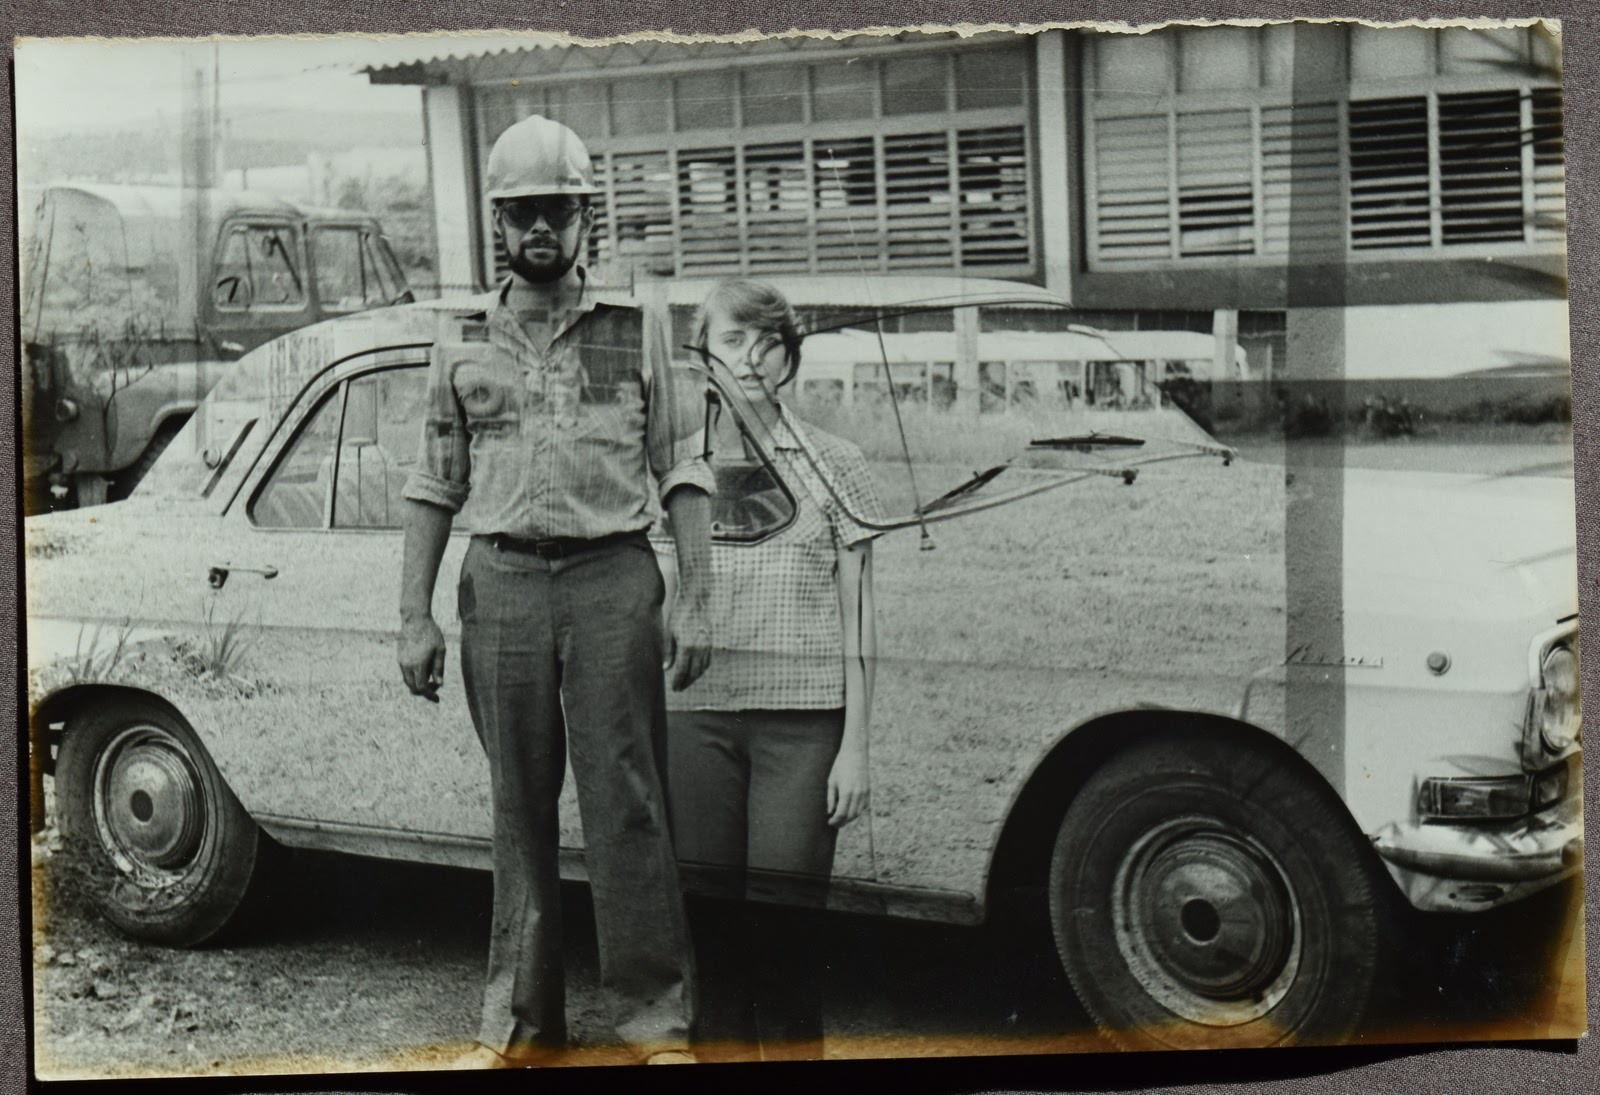 1981-1982. Фото 14. На фоне «Волги», девушка - москвичка-переводчица Чурляева